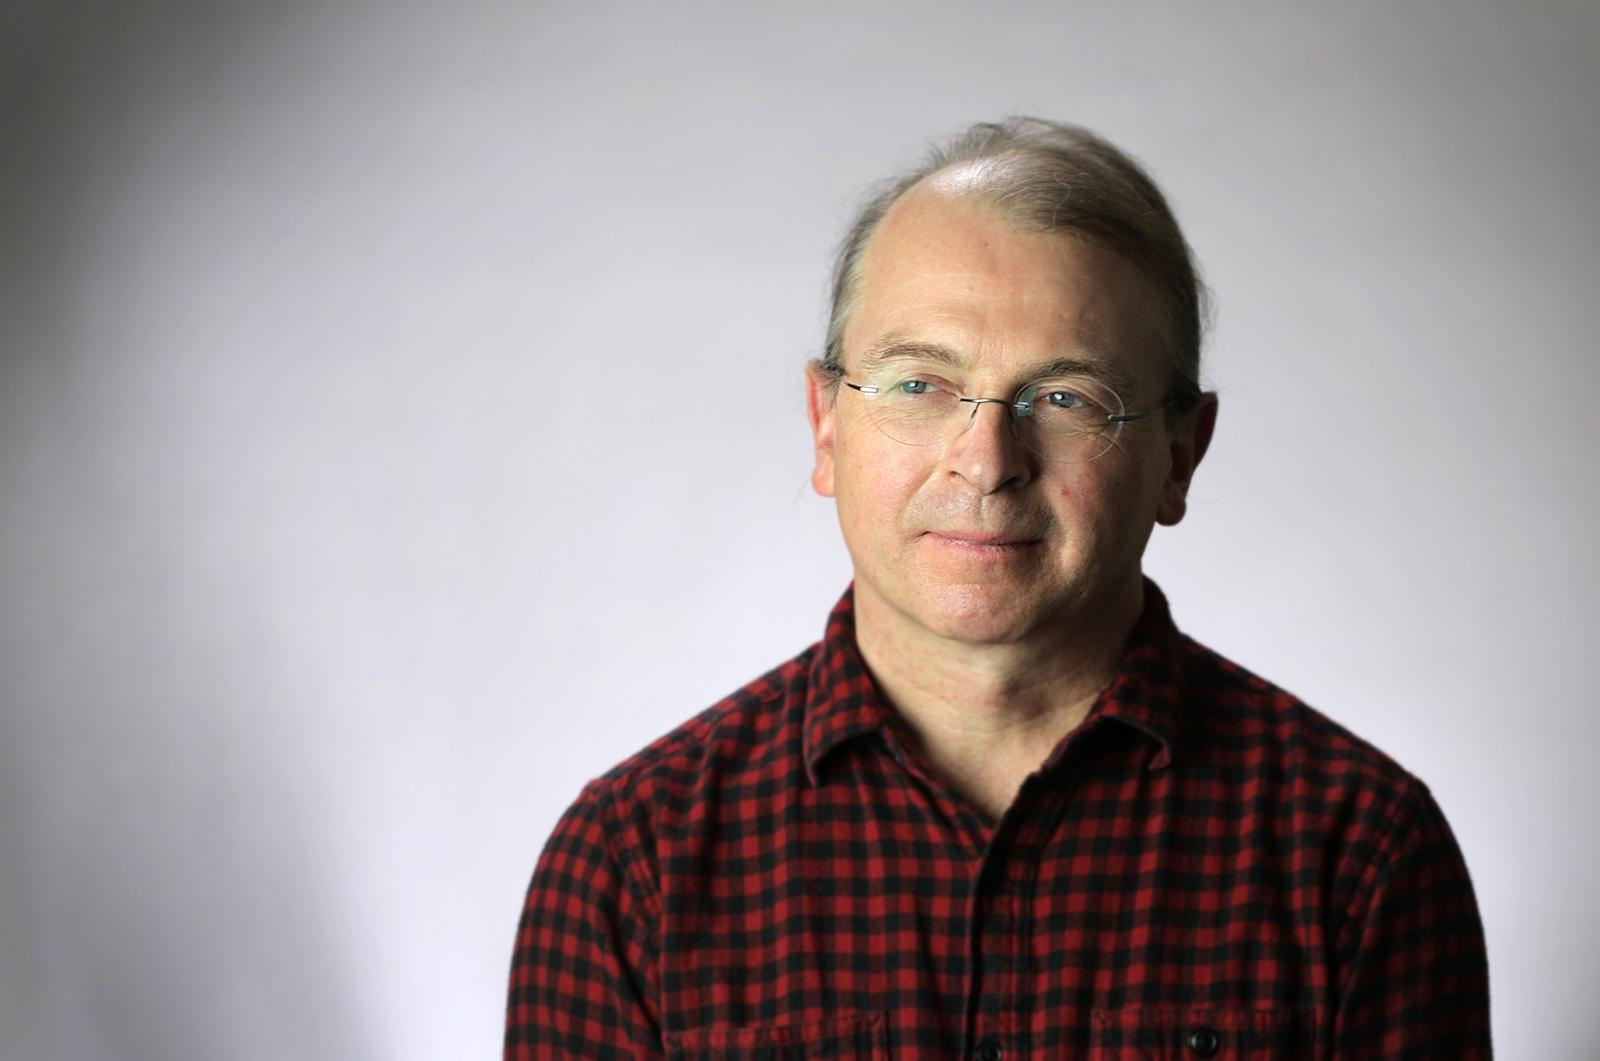 MECHE PEOPLE: Seth Lloyd | MIT Department of Mechanical Engineering